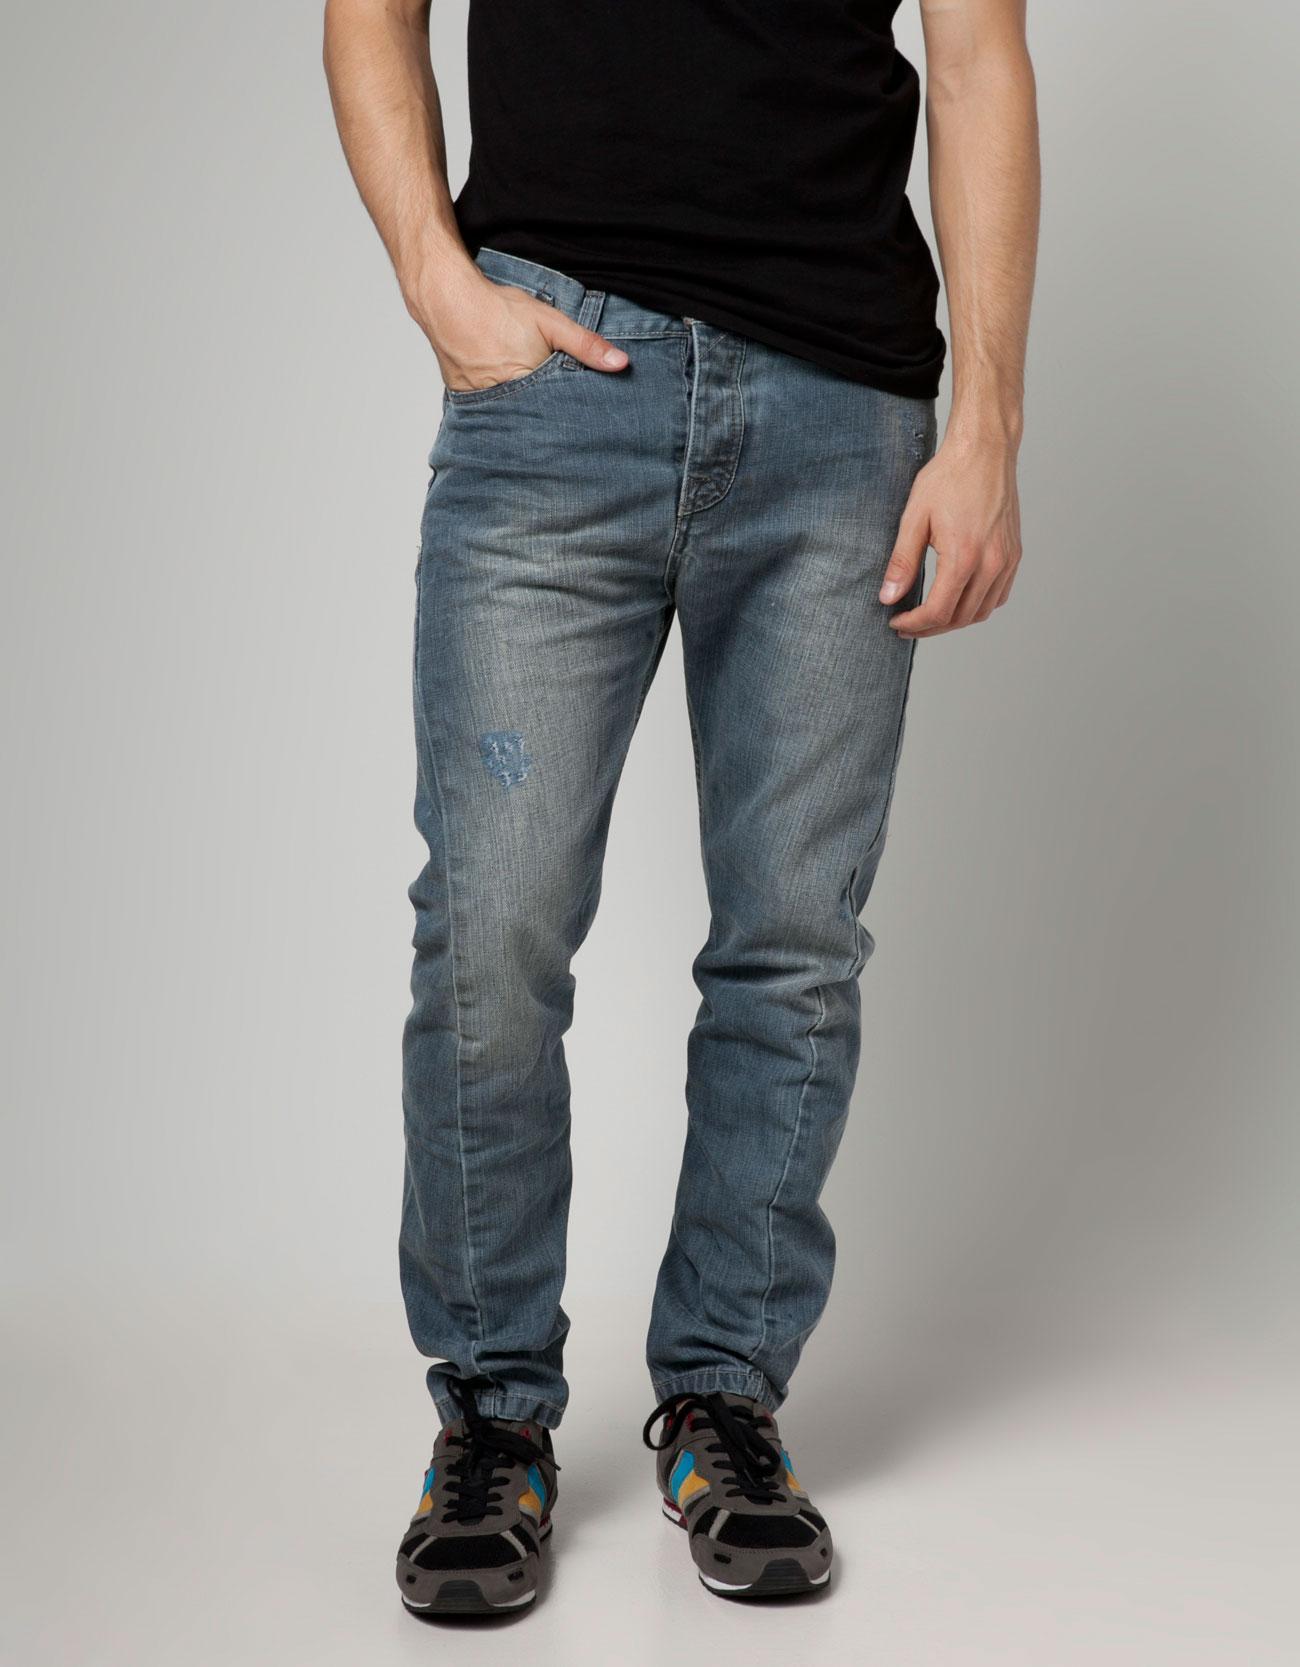 Bershka Russian Federation - Comfort twister jeans